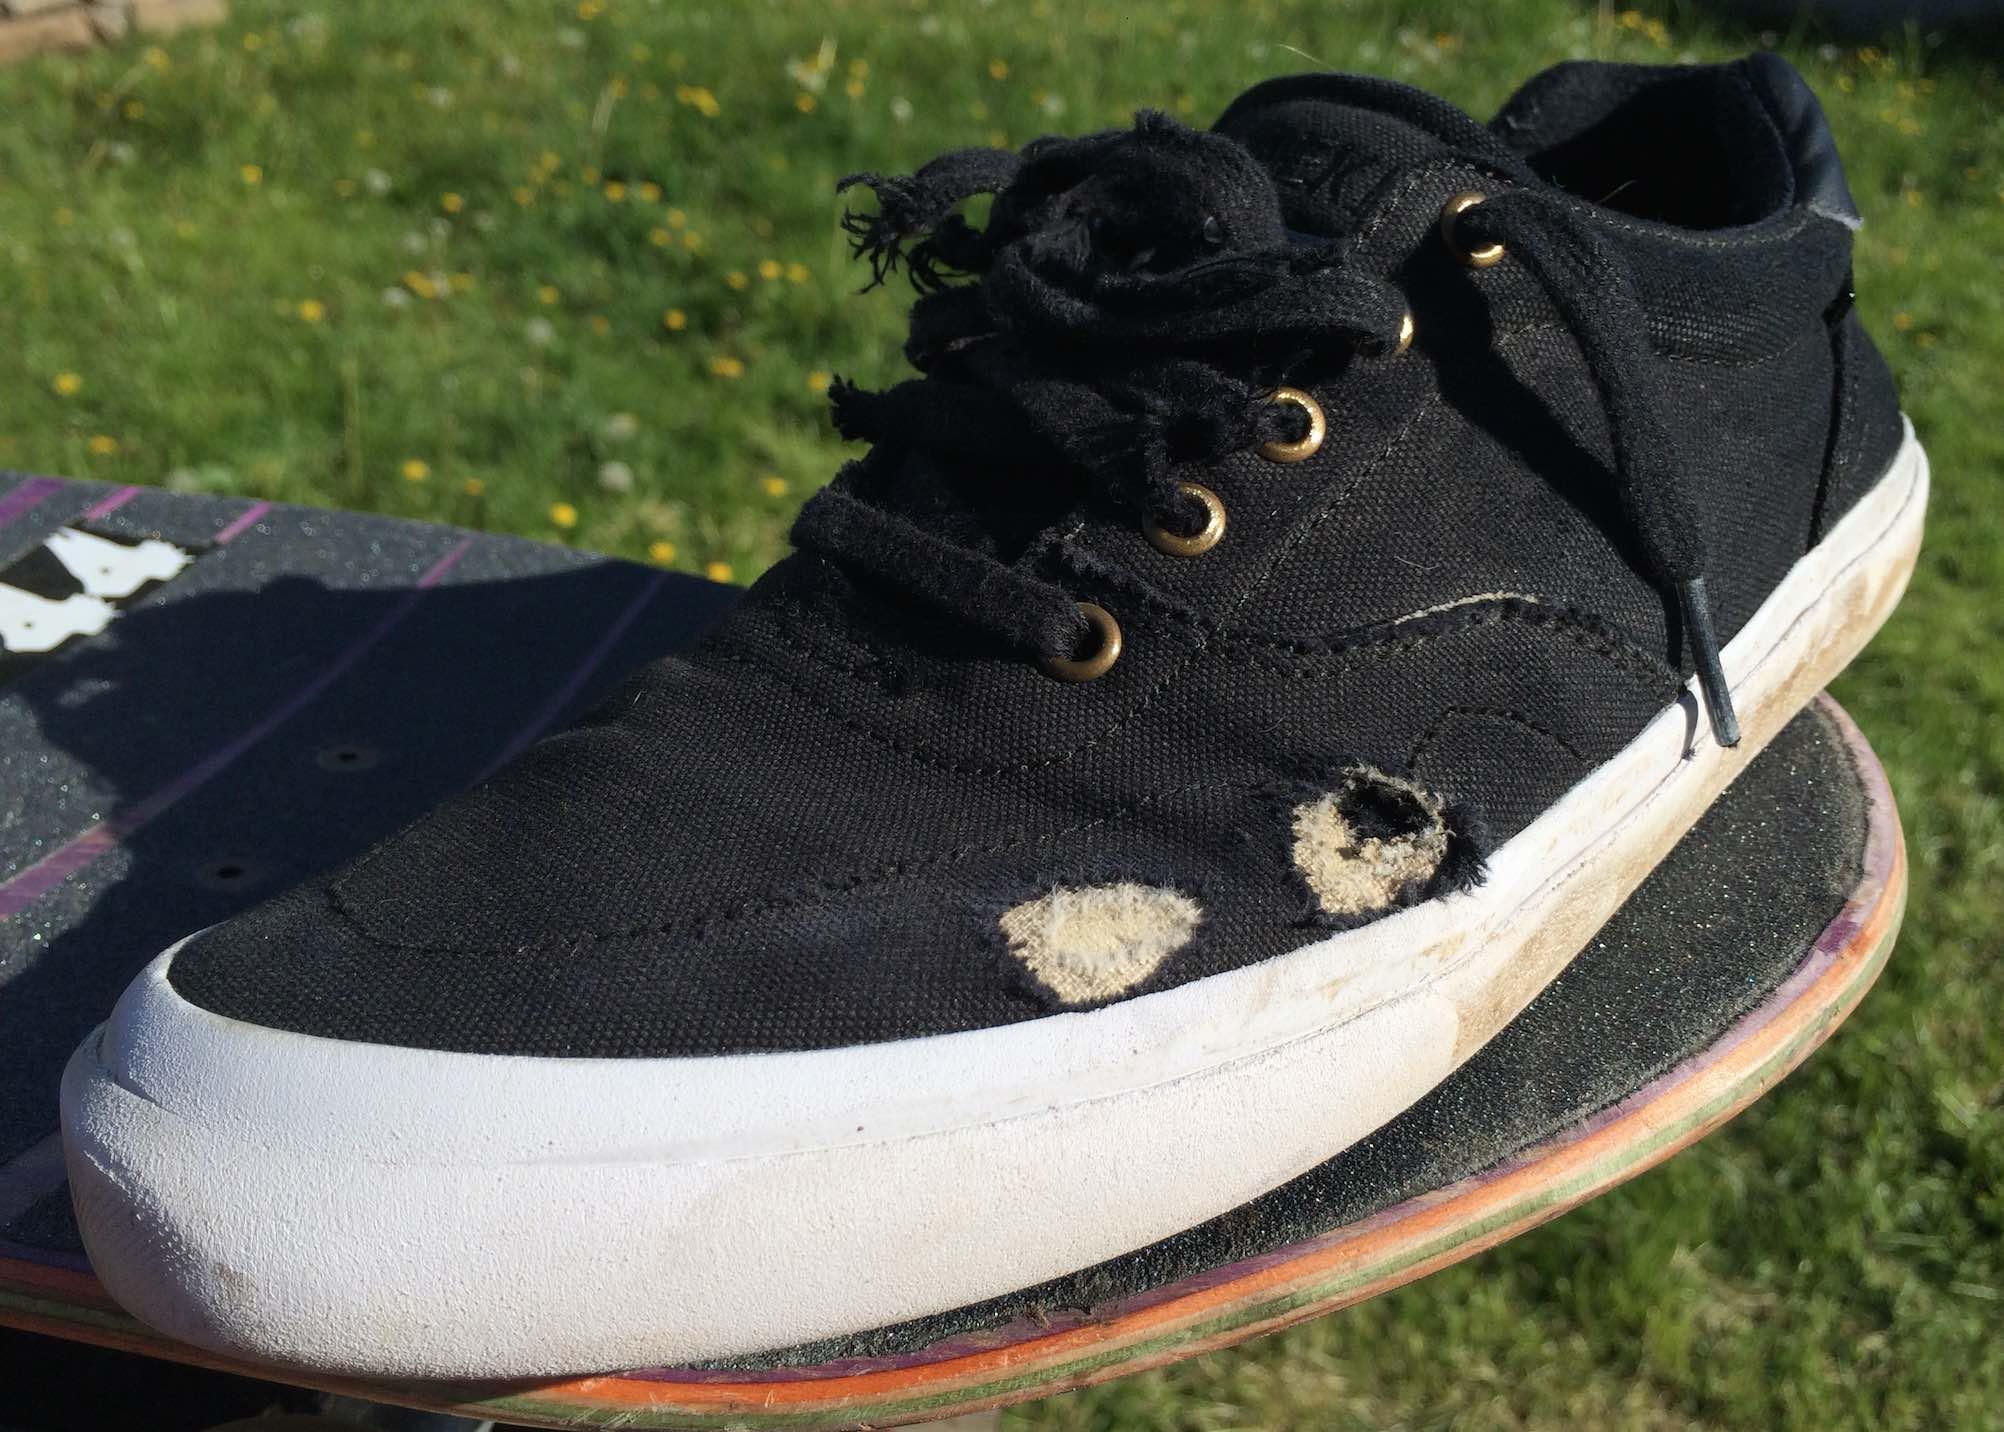 vegan skate shoes dekline shoe-goo